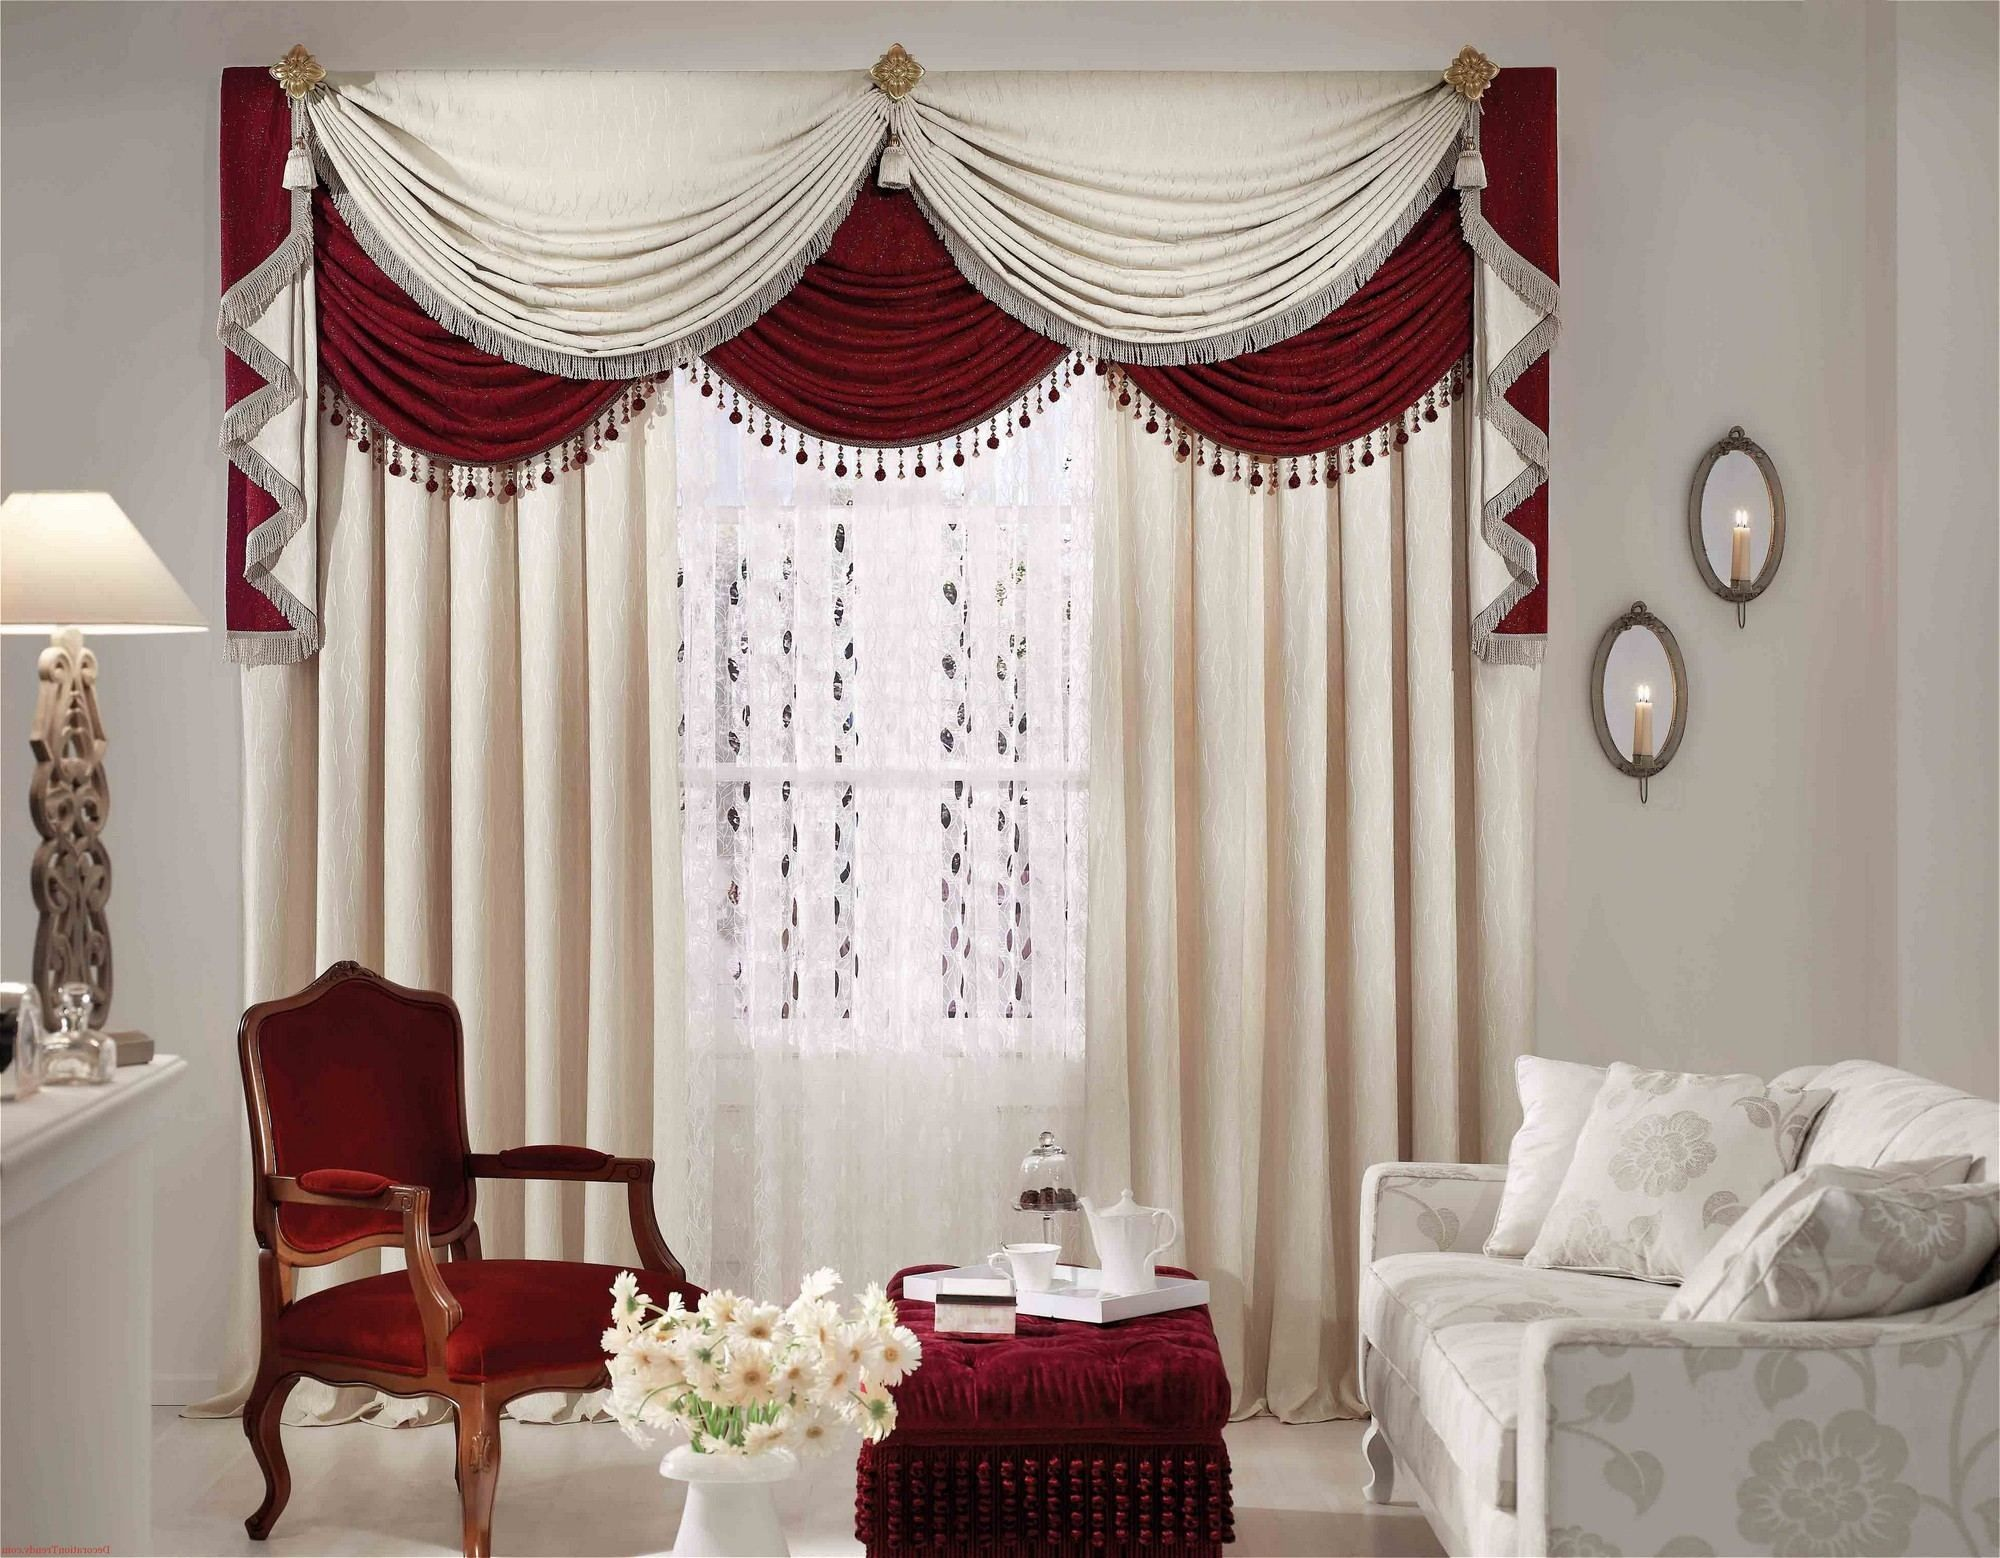 Extraordinary Curtains Design 2015 For Living Room Living Room